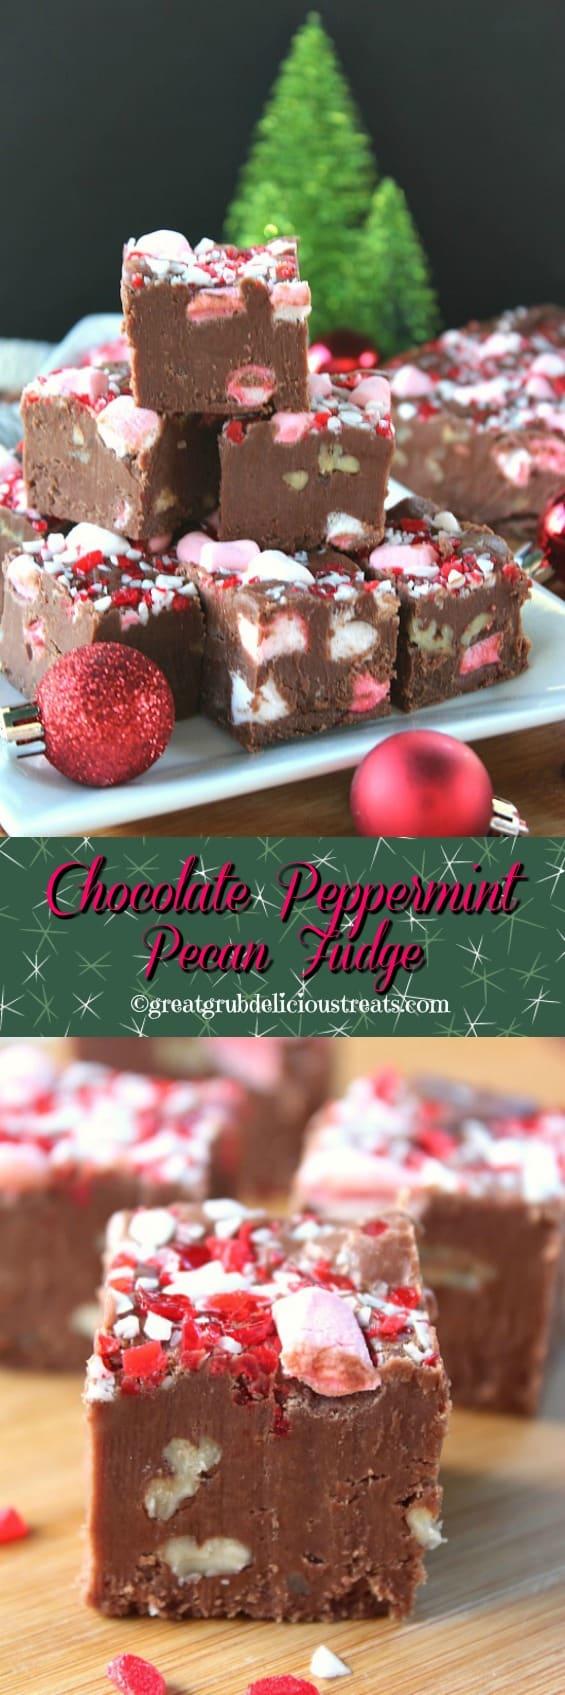 Chocolate Peppermint Pecan Fudge